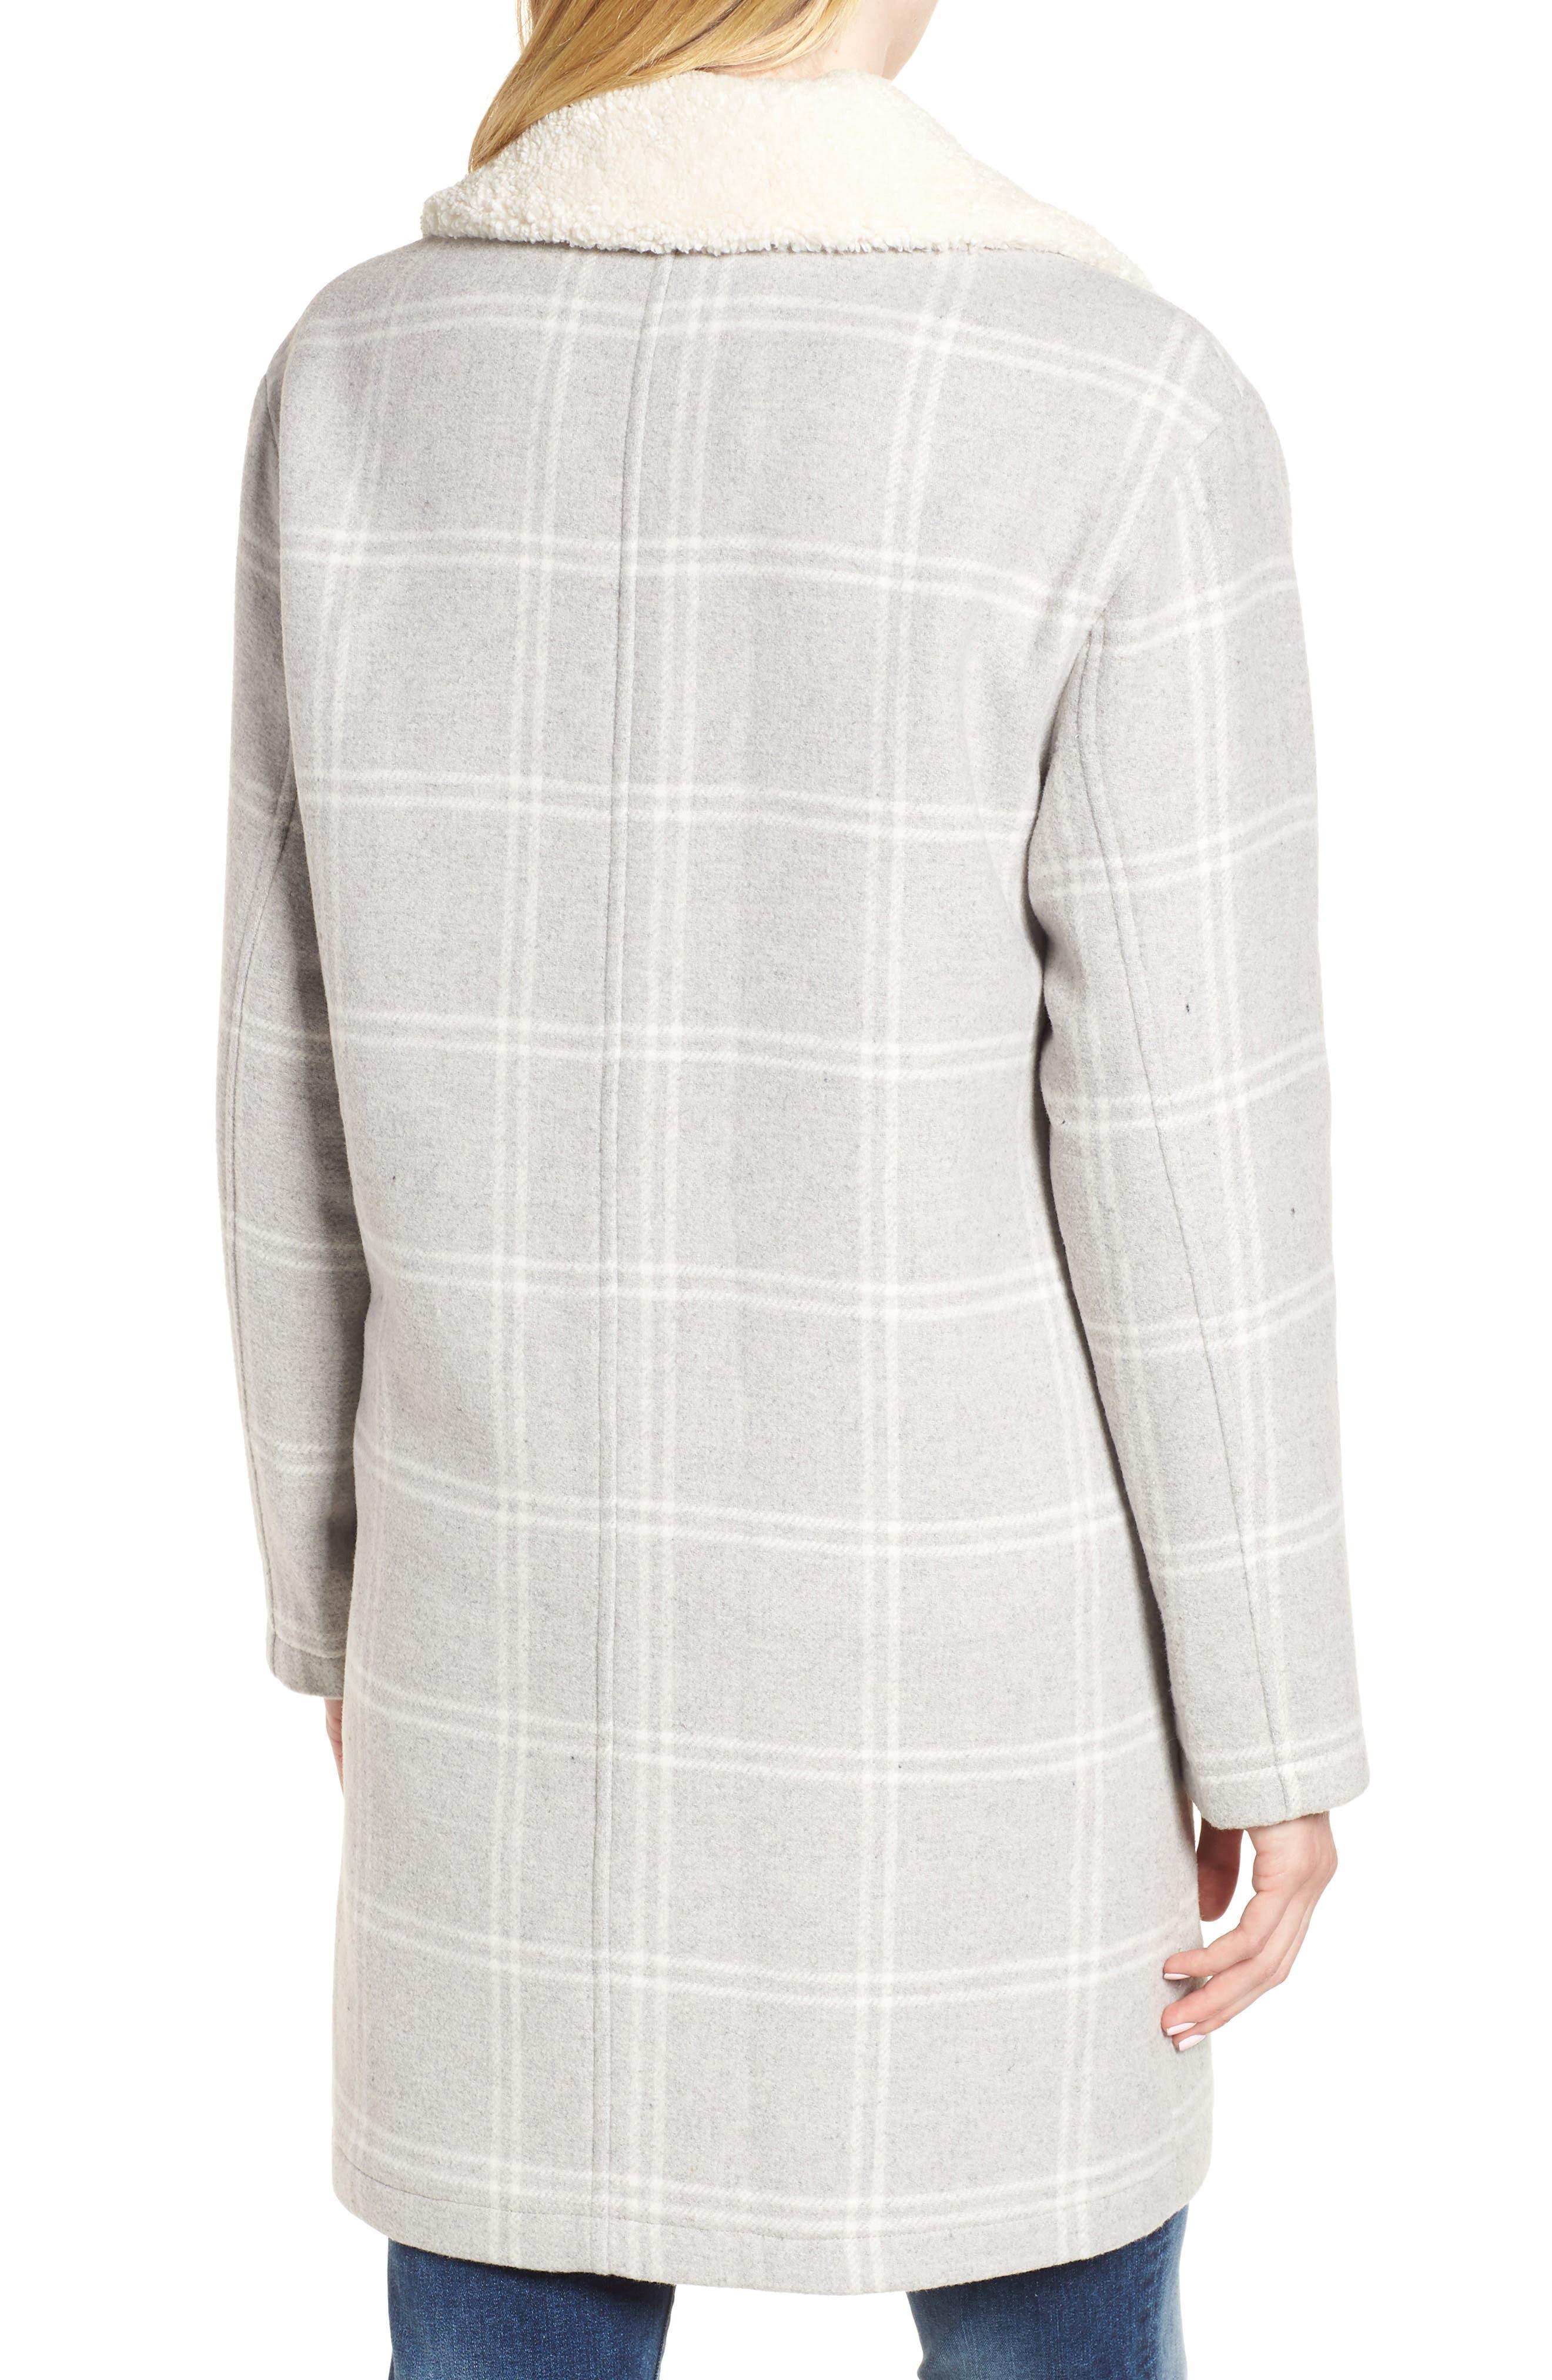 Wool Top Coat,                             Alternate thumbnail 2, color,                             GREY PLAID WOOL